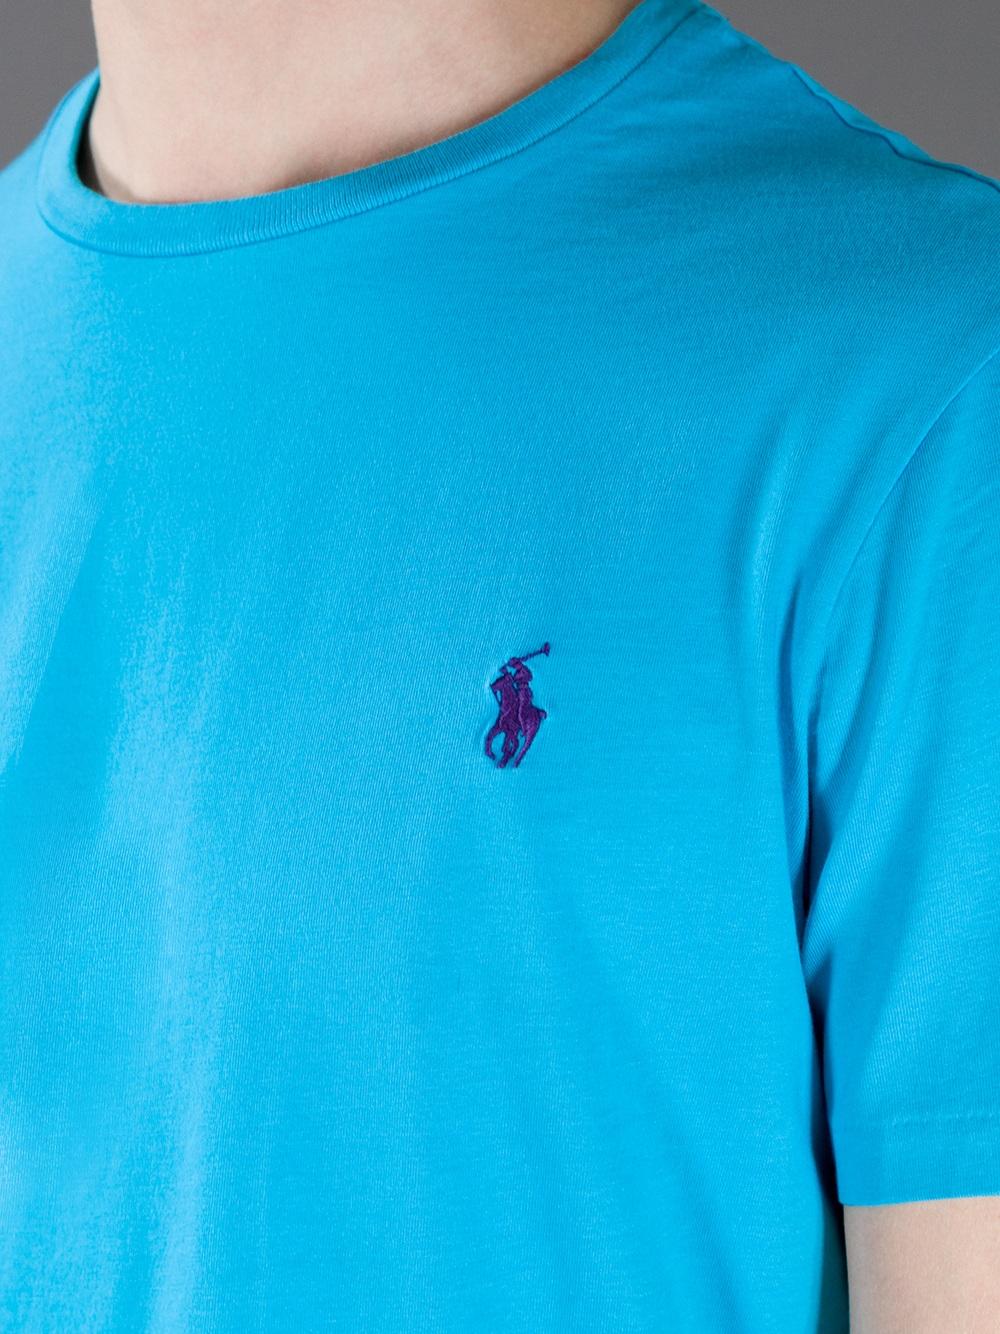 Polo ralph lauren classic t shirt in blue for men lyst for Aqua blue color t shirt